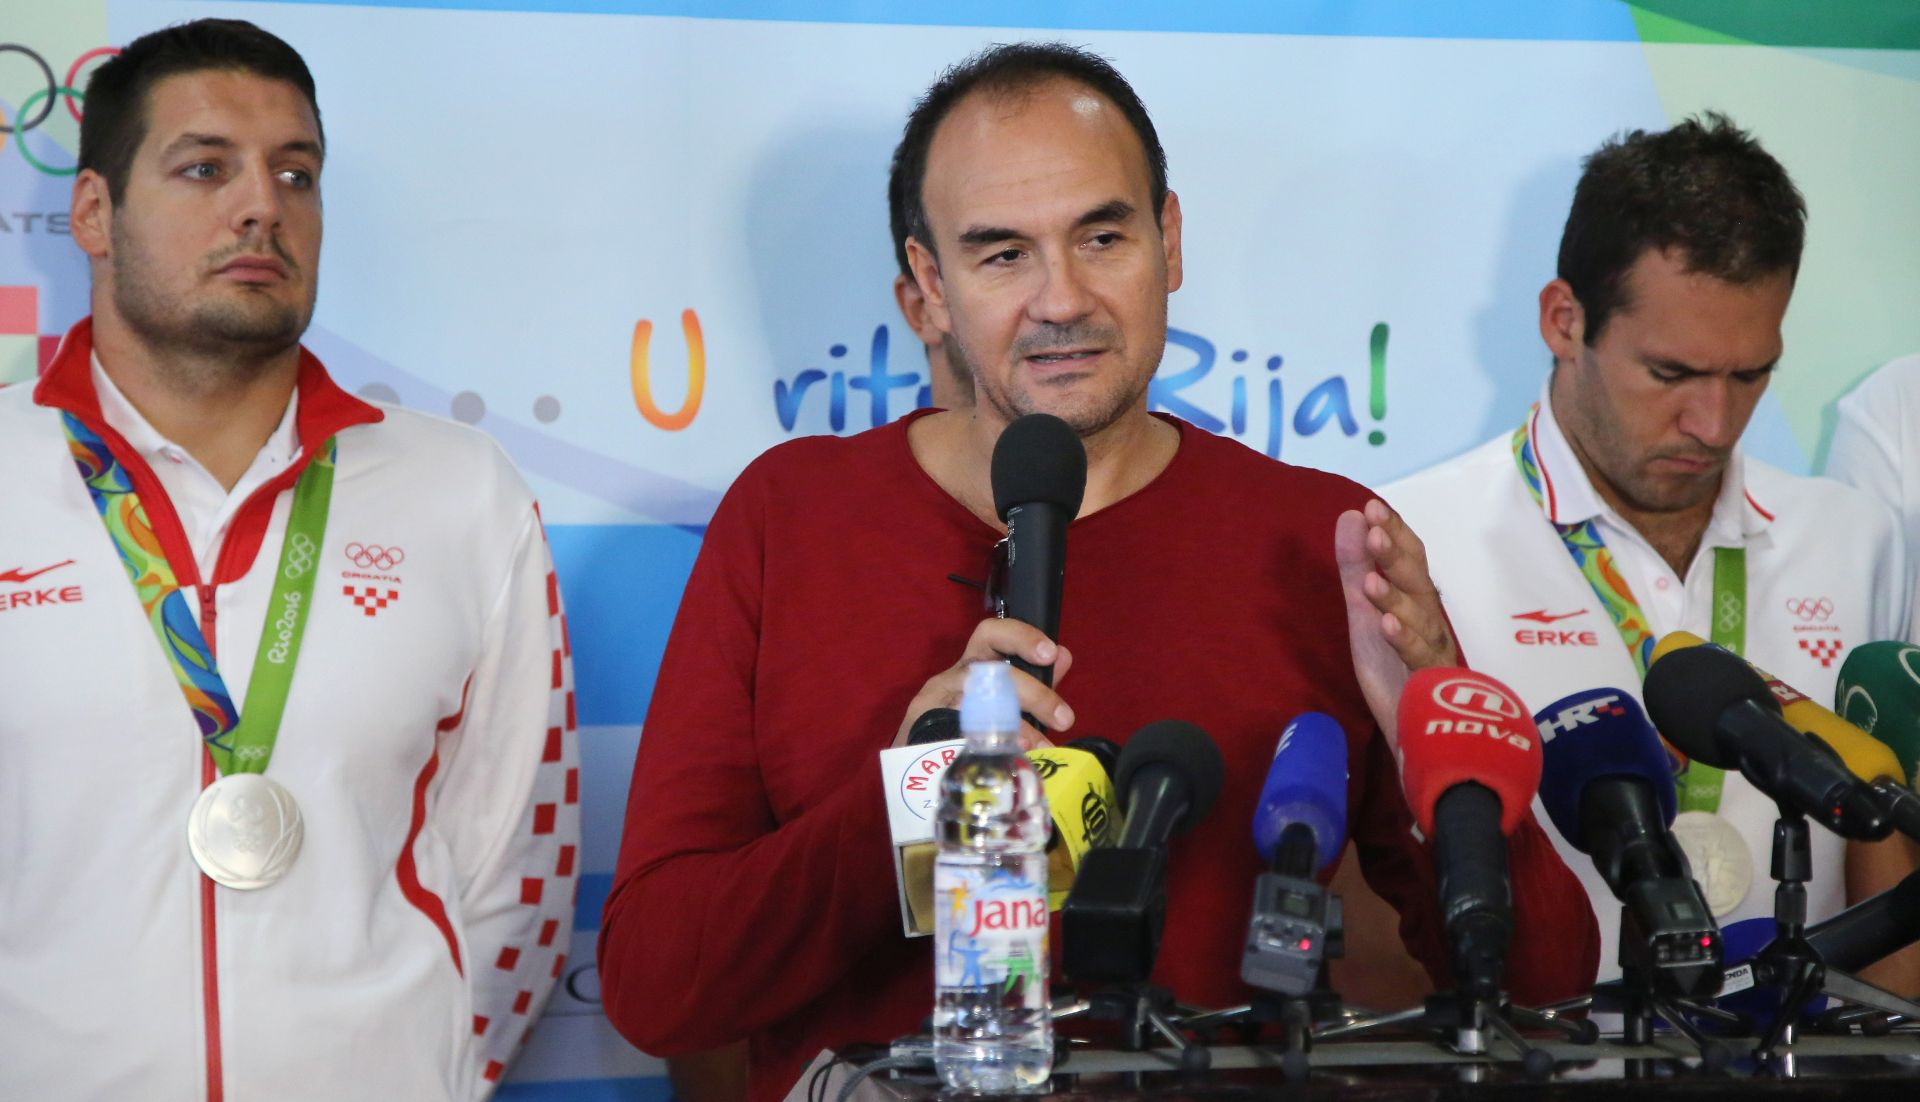 VATERPOLO Bukić: Nastavljen kontinuitet osvajanja medalja